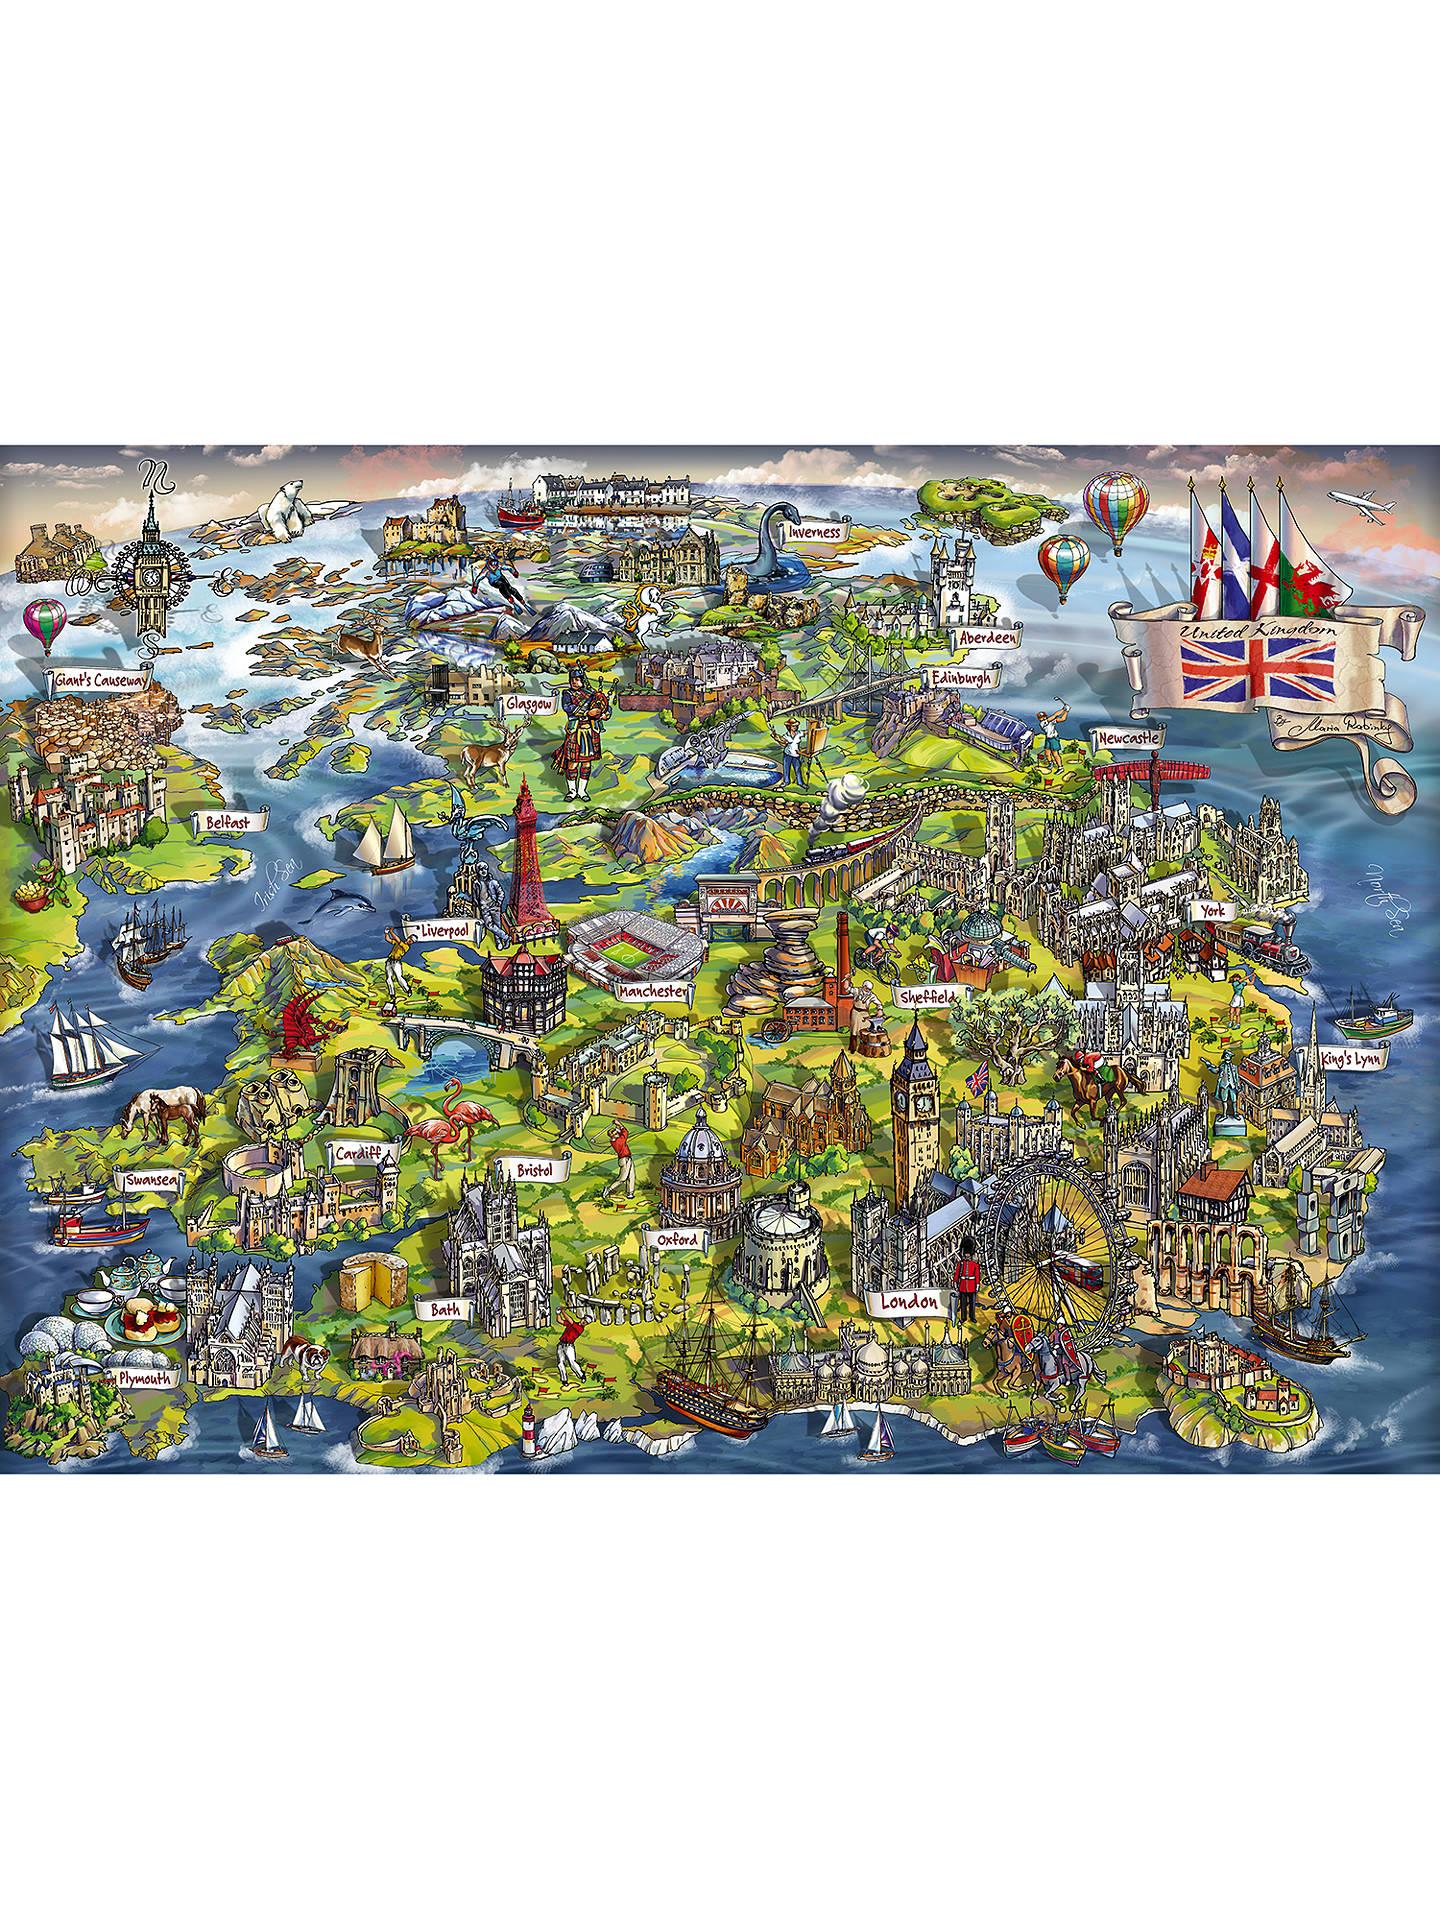 Map Of Uk Jigsaw.Gibsons Beautiful Britain Uk Map Jigsaw Puzzle 1000 Pieces